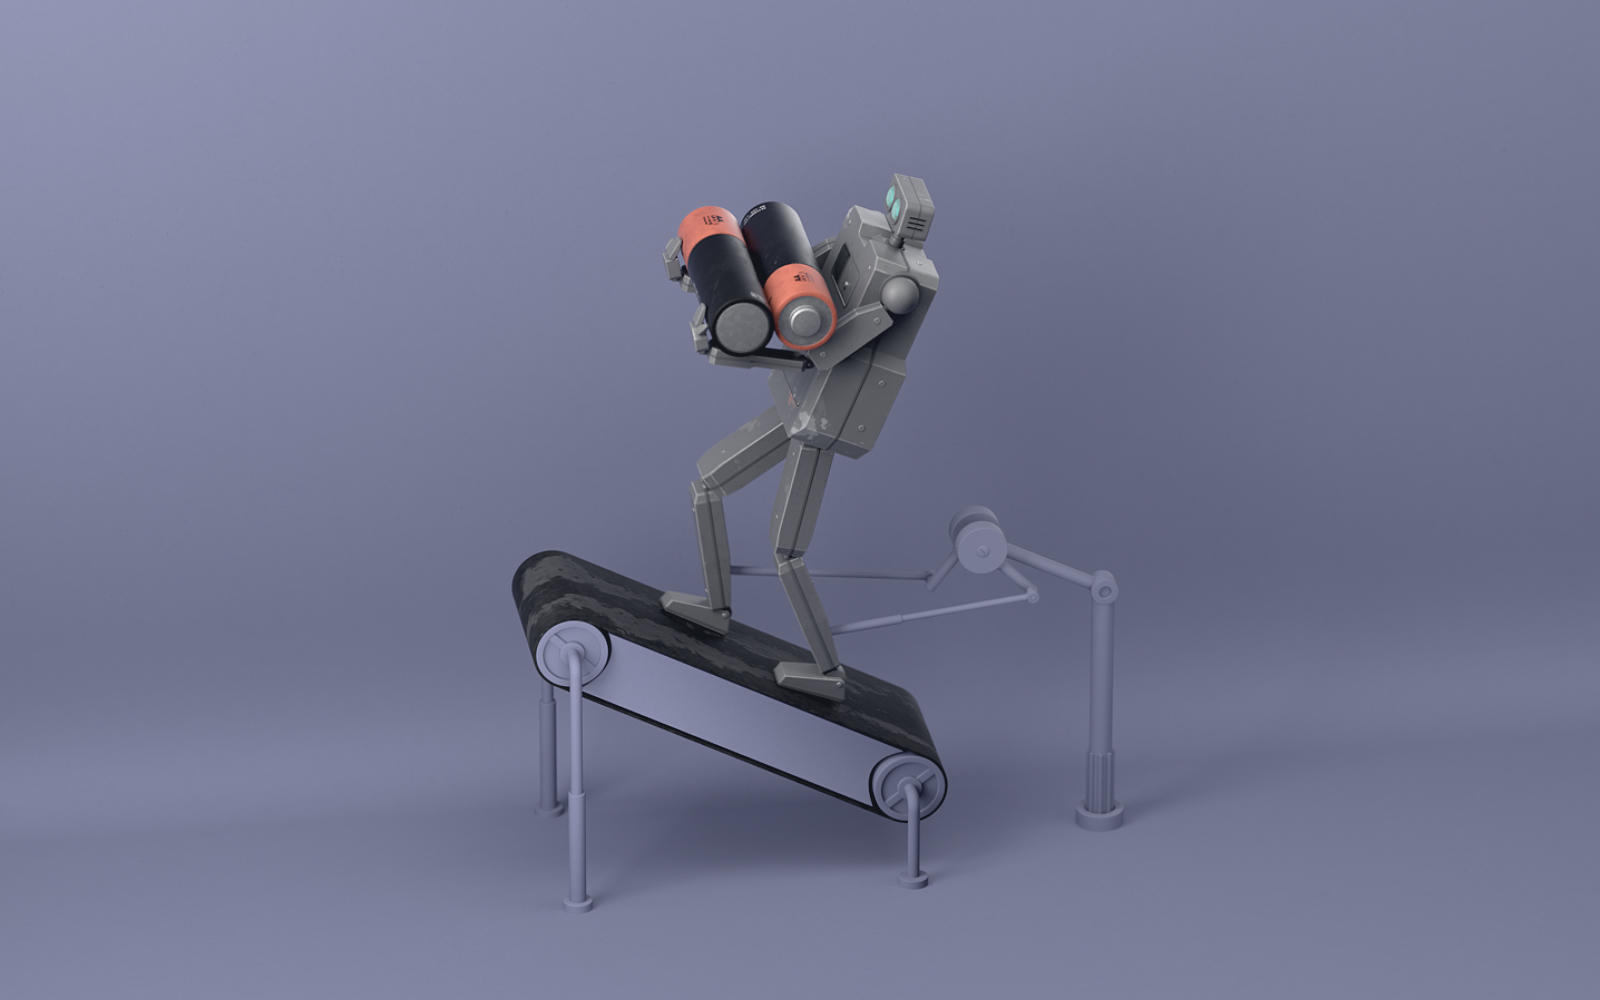 Vicious_Cycle_Treadmill.jpg